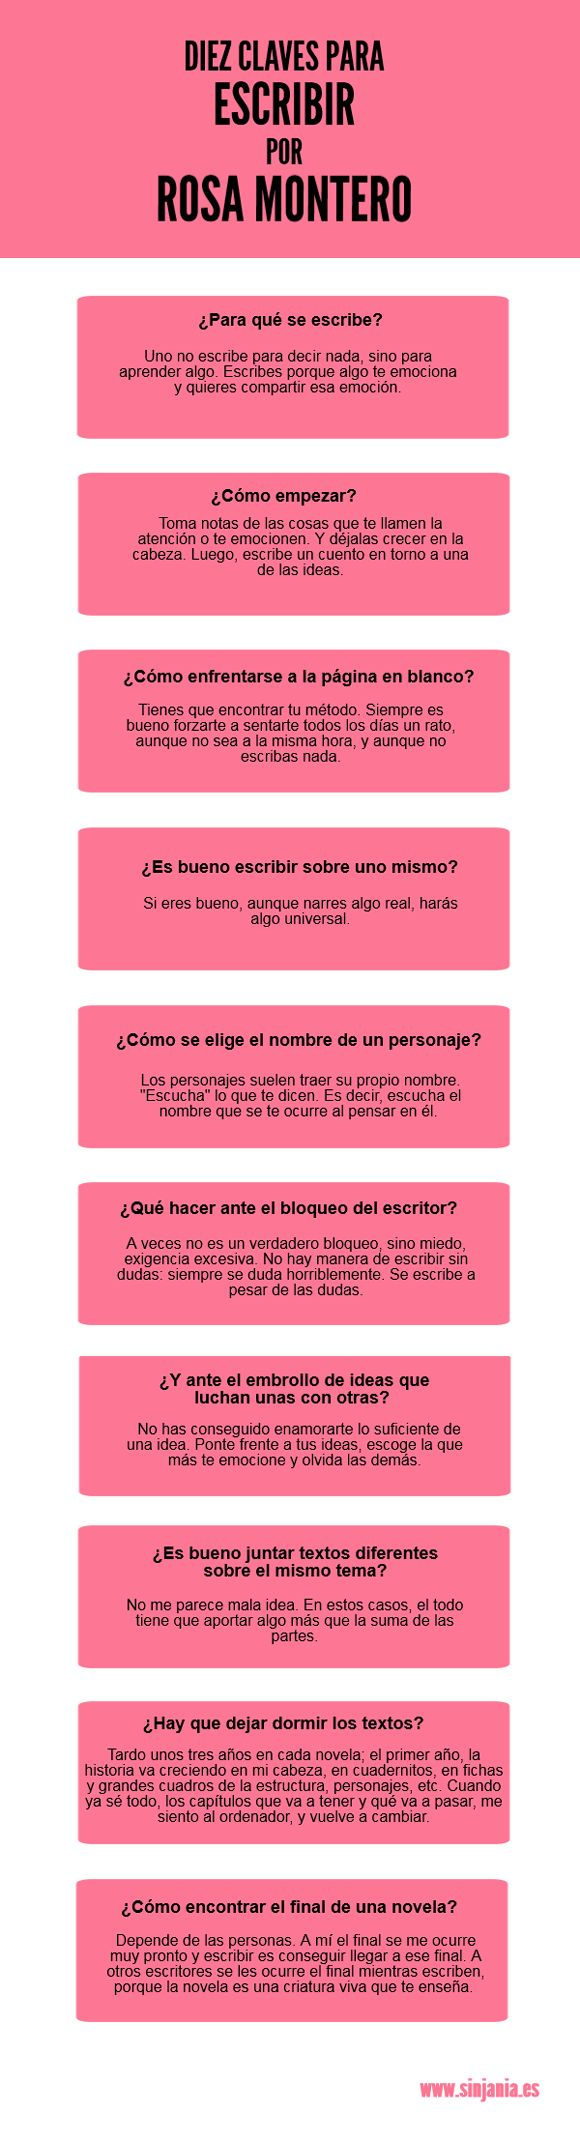 Diez claves para escribir, de Rosa Montero.